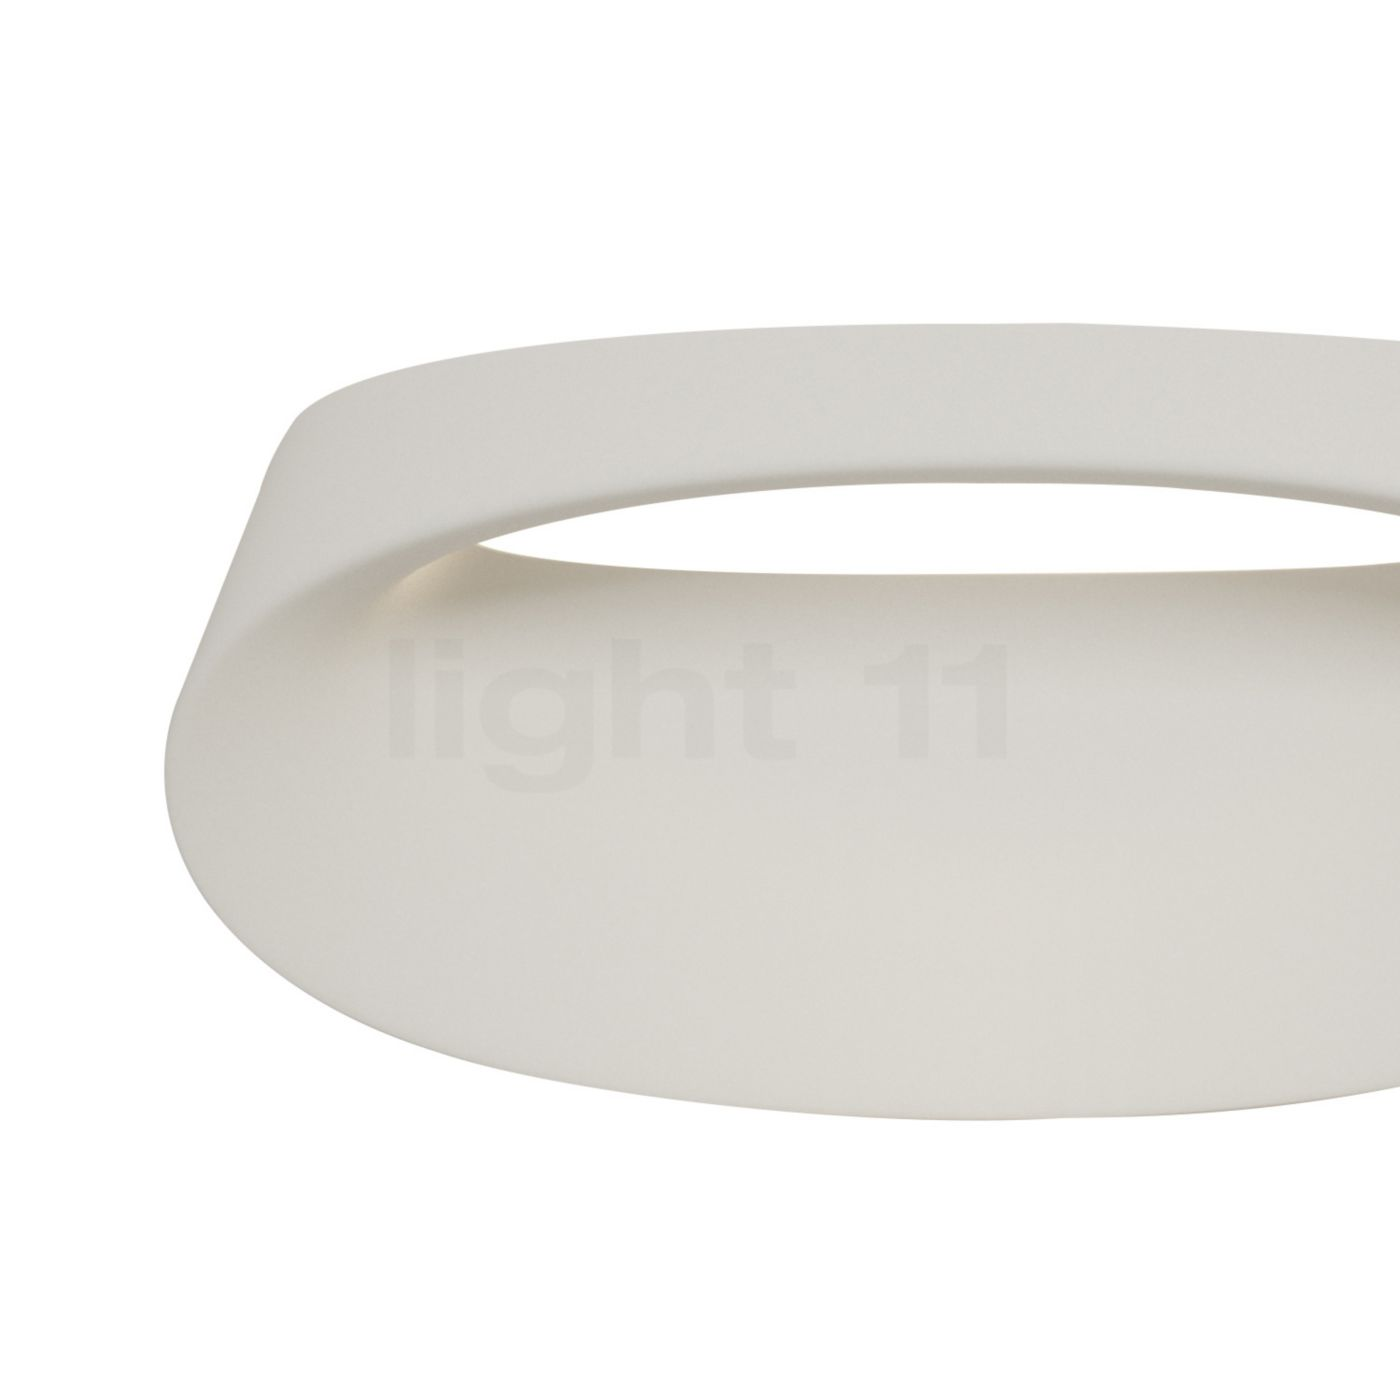 Fontana Arte Bonnet Parete LED kaufen bei light11.de